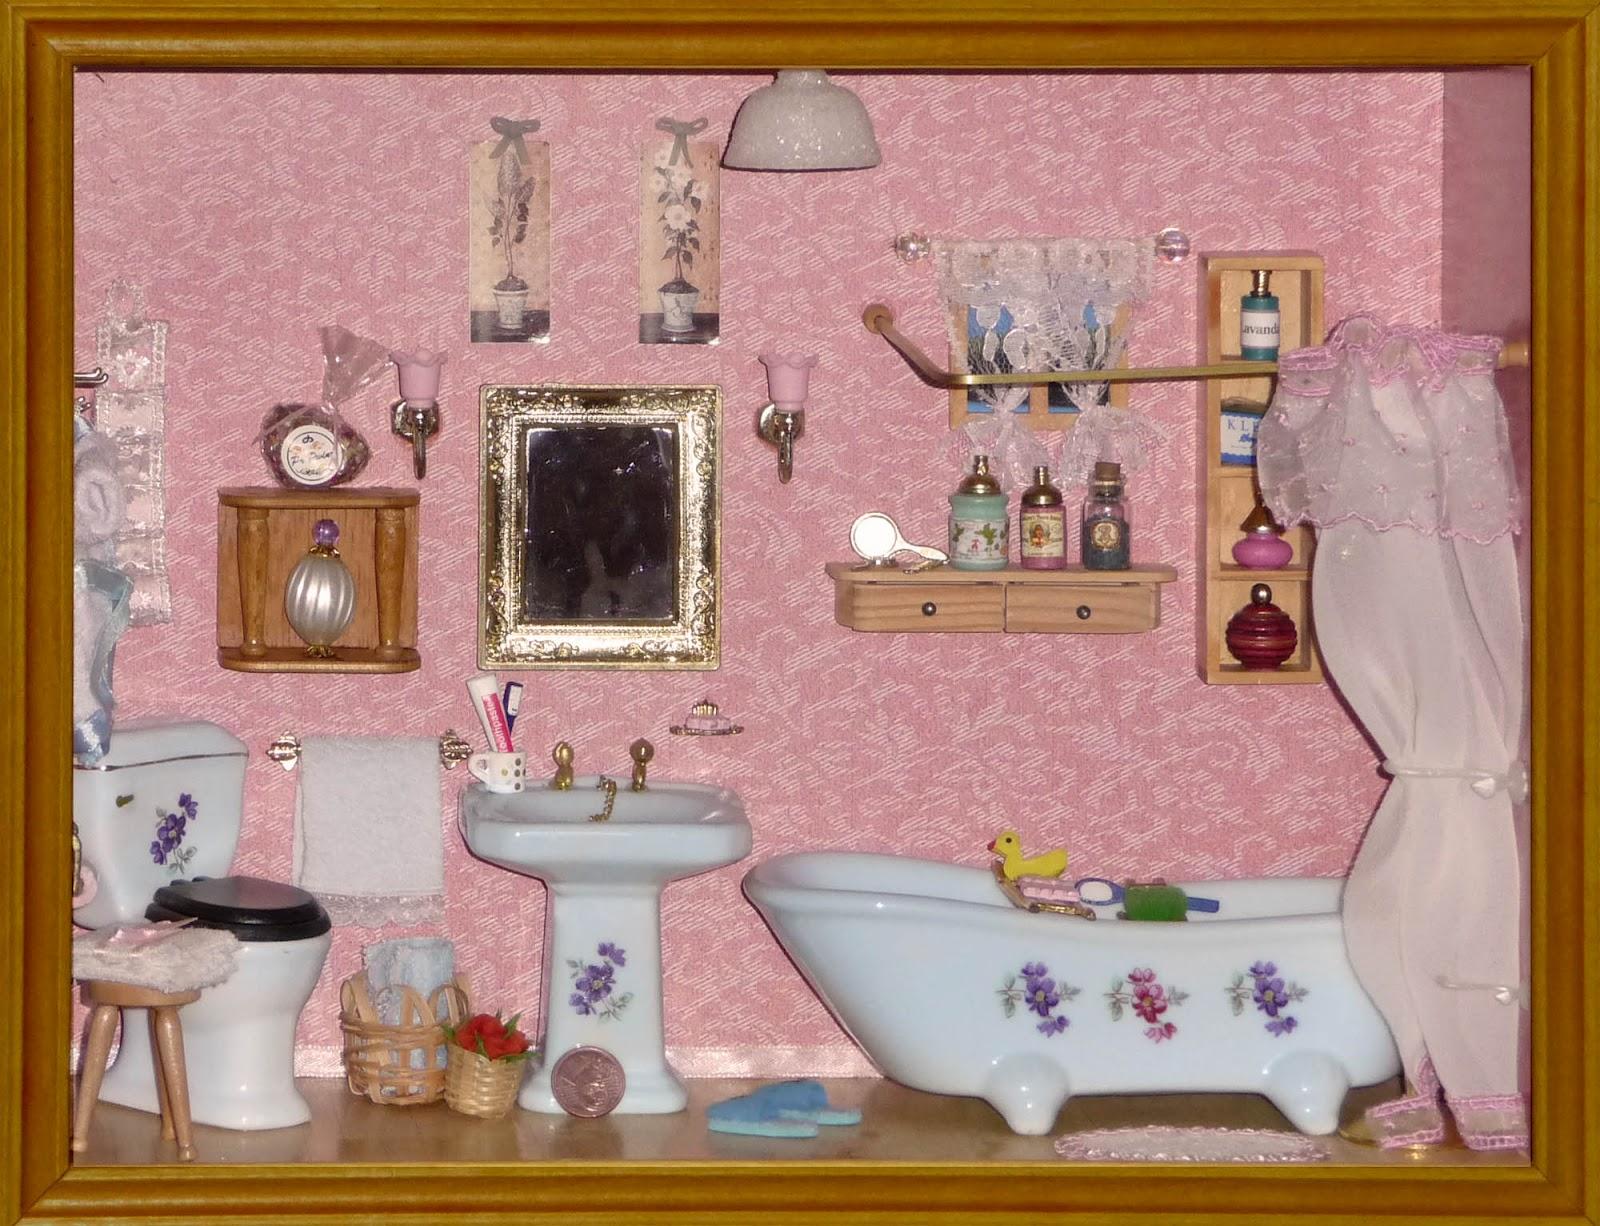 Morandi sisters microworld bathroom roombox bagnetto - Bagno in miniatura ...